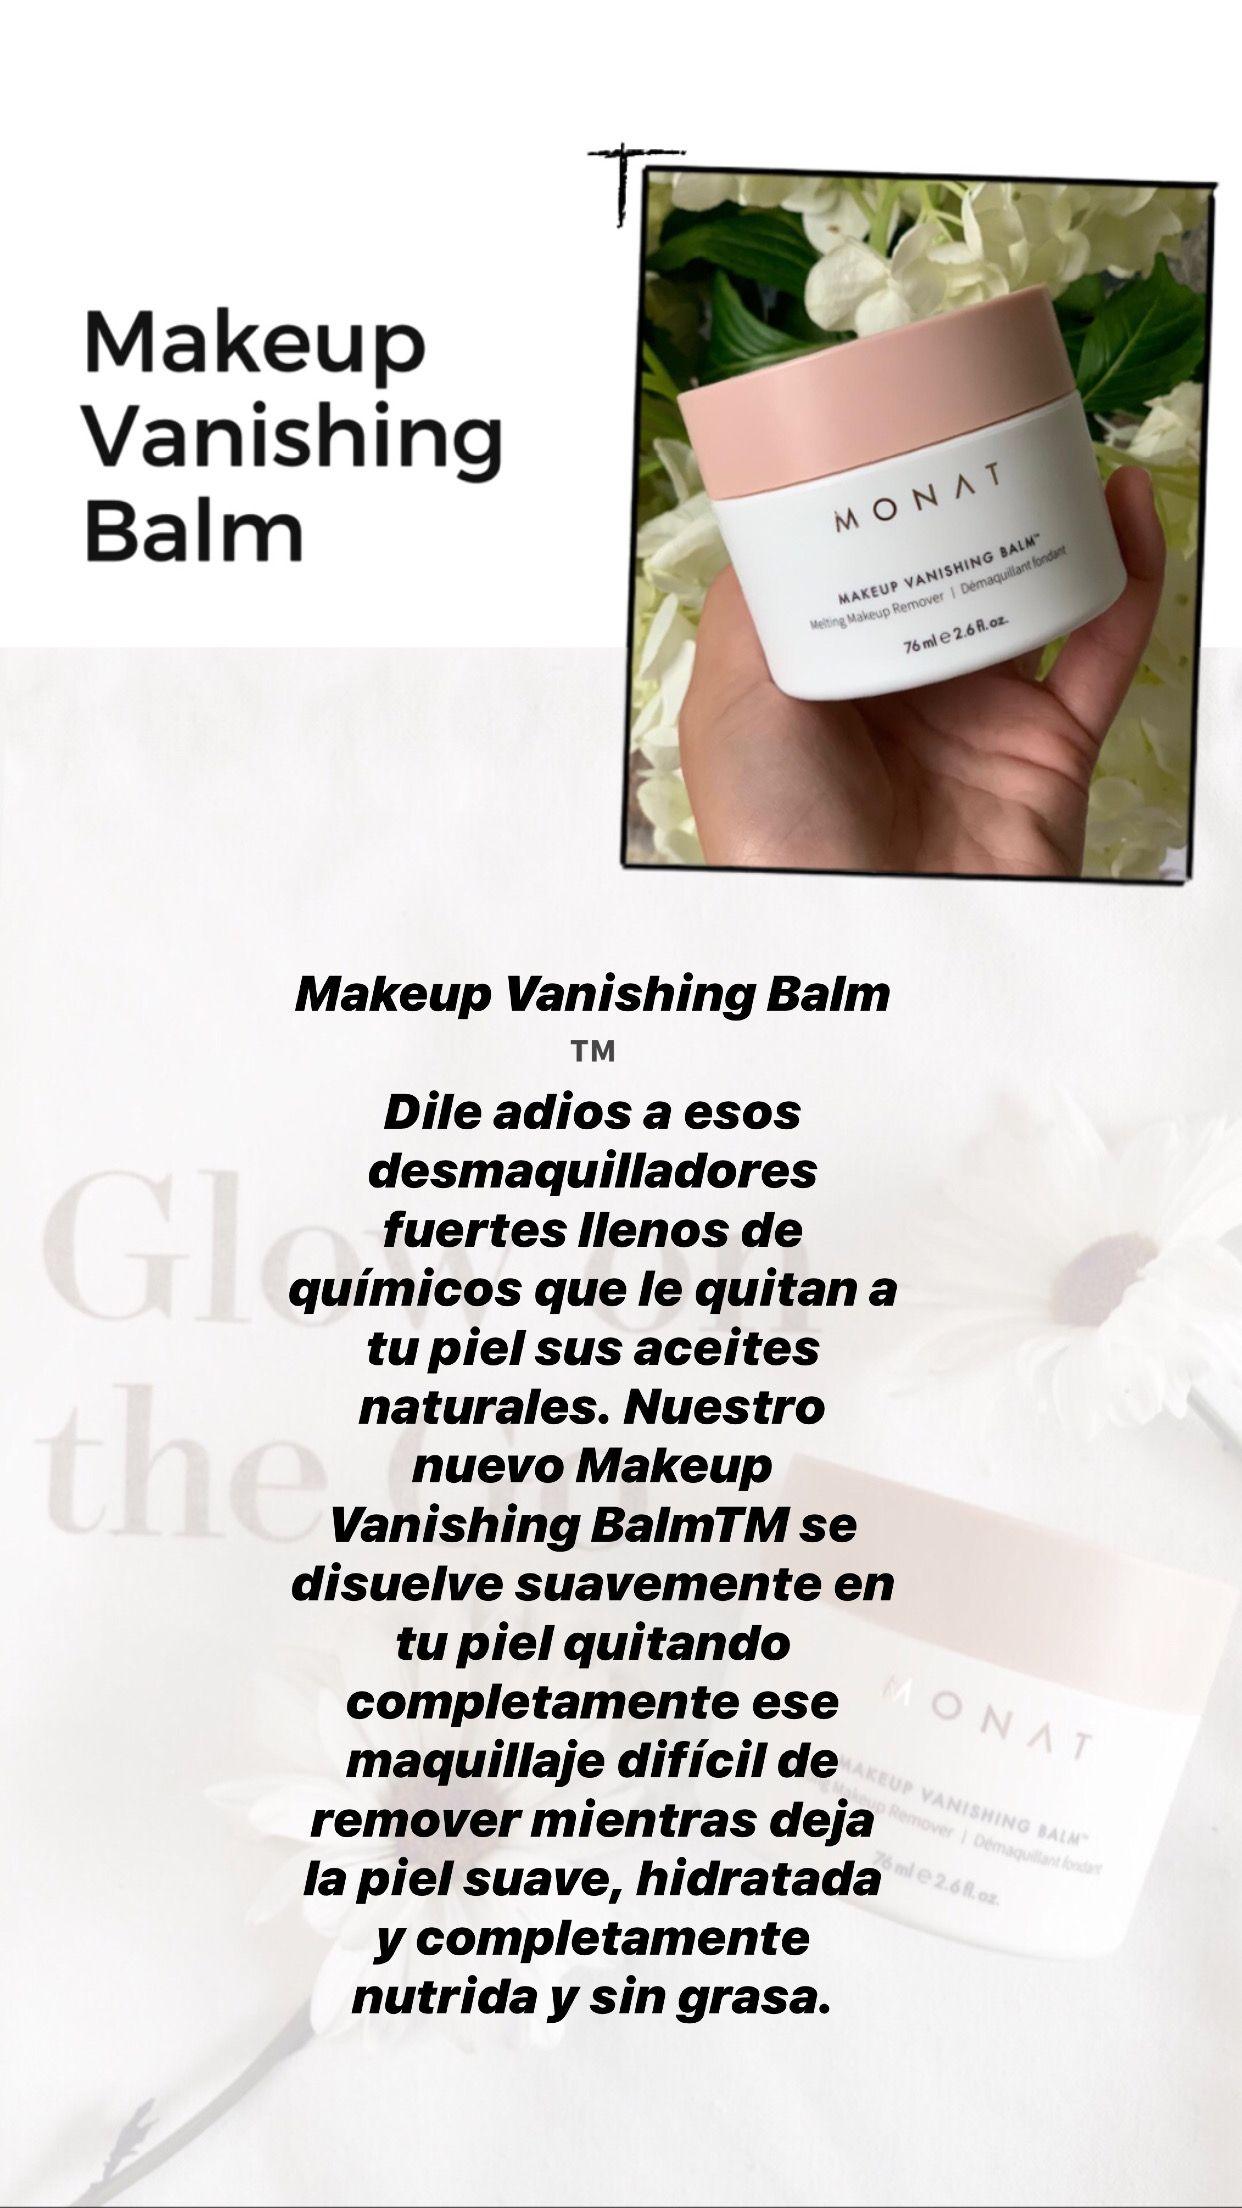 Makeup Vanishing Balm in 2020 Vegan makeup, The balm